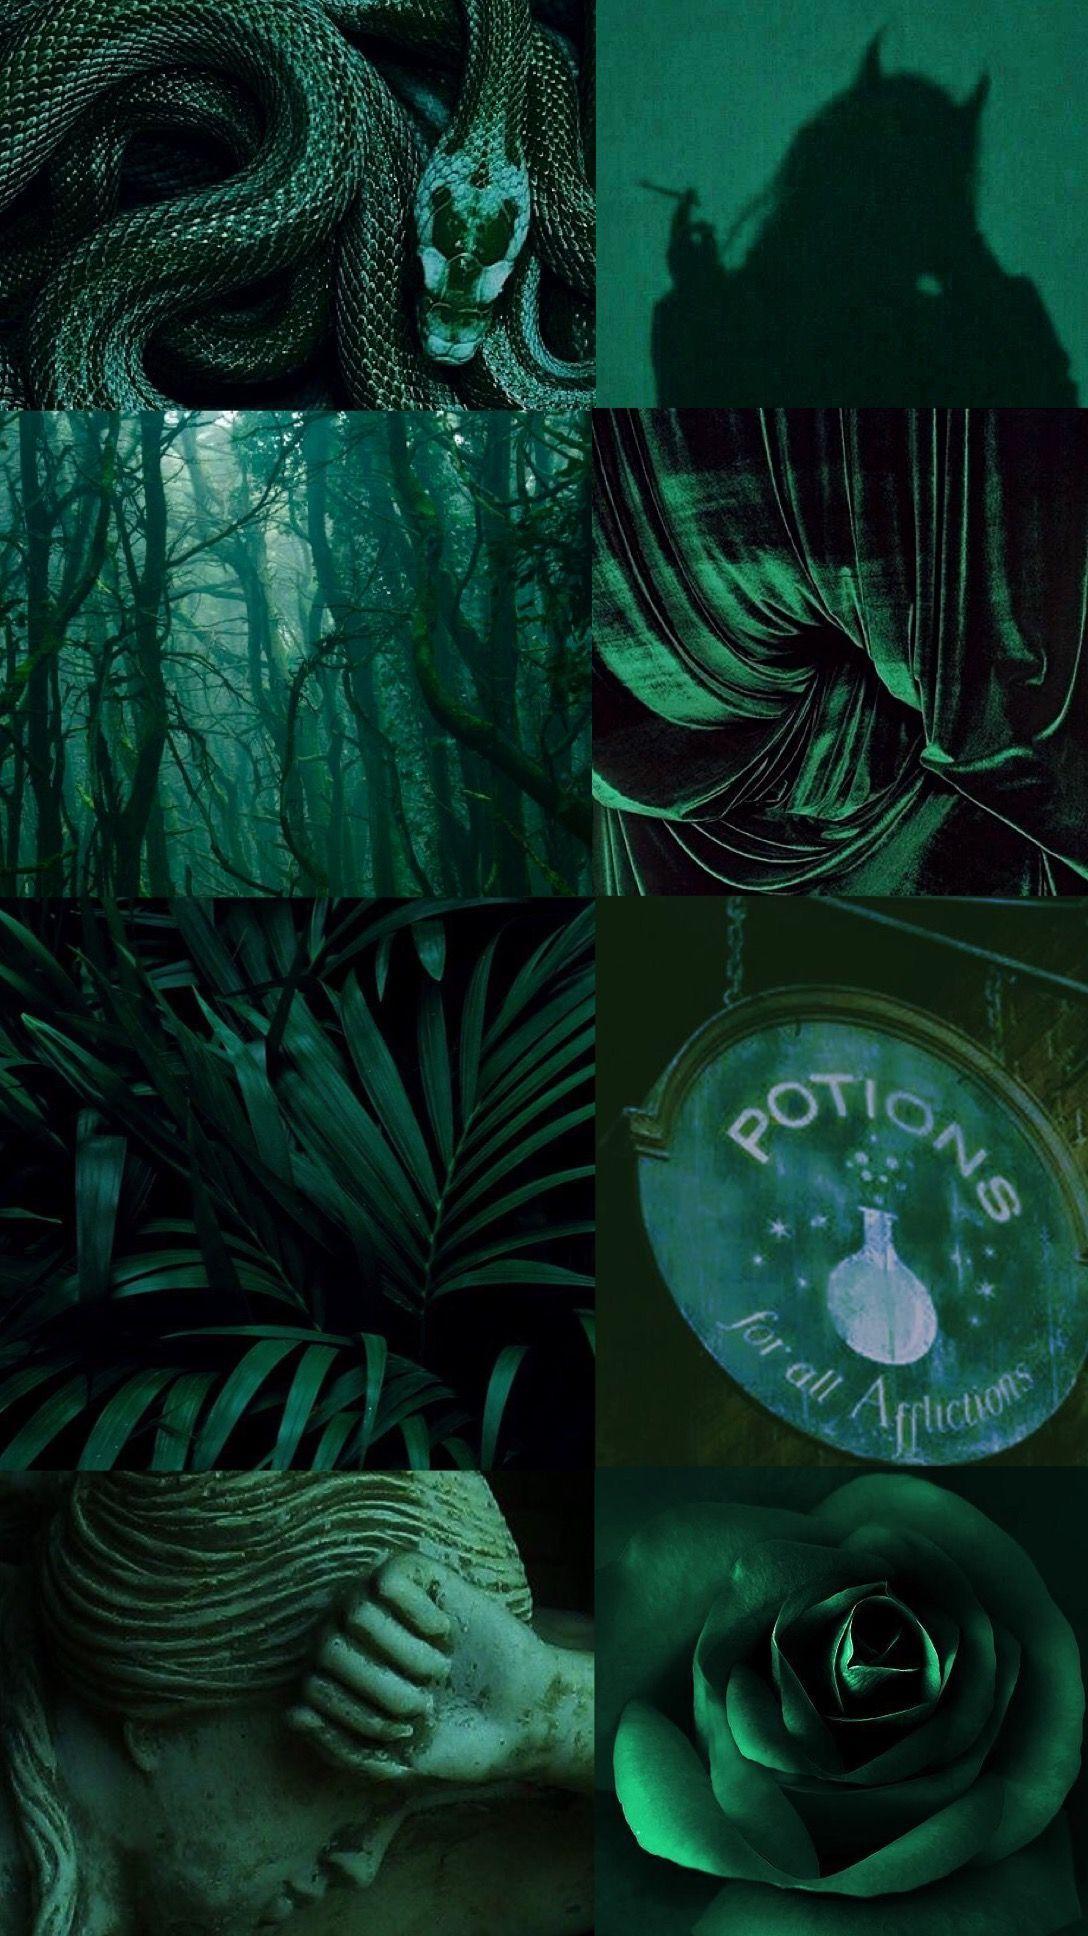 Neon Green Aesthetic Wallpapers Wallpaper Cave